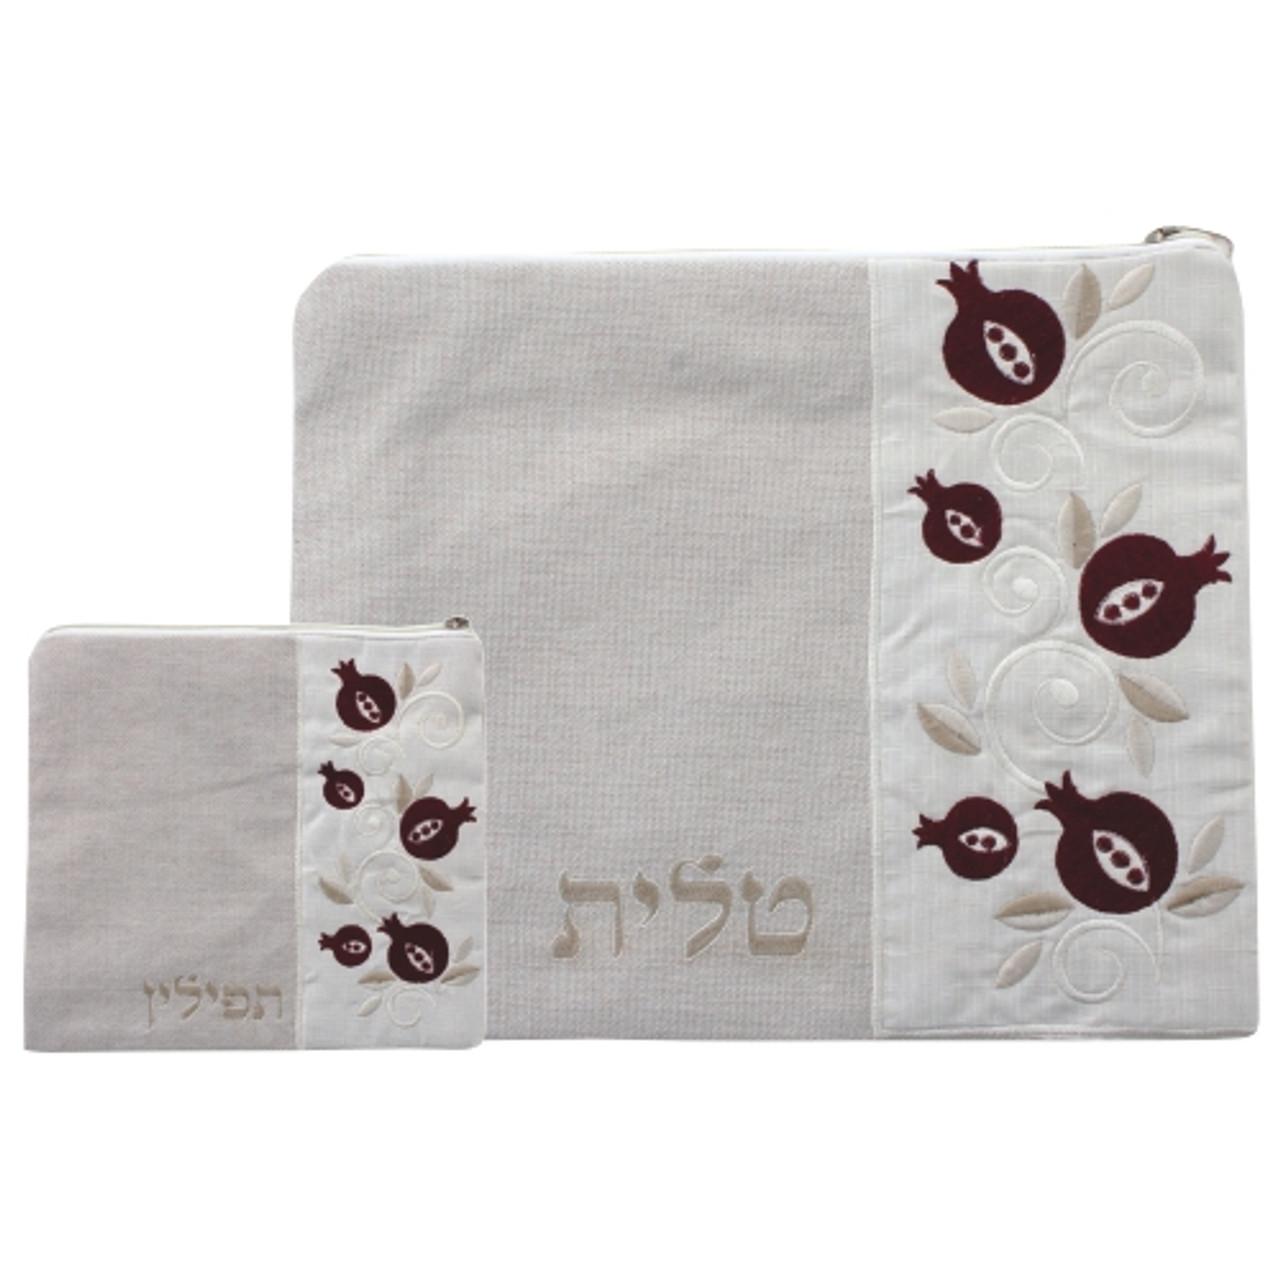 Beaver Brown Linen Tallit Bag with Pomegranates